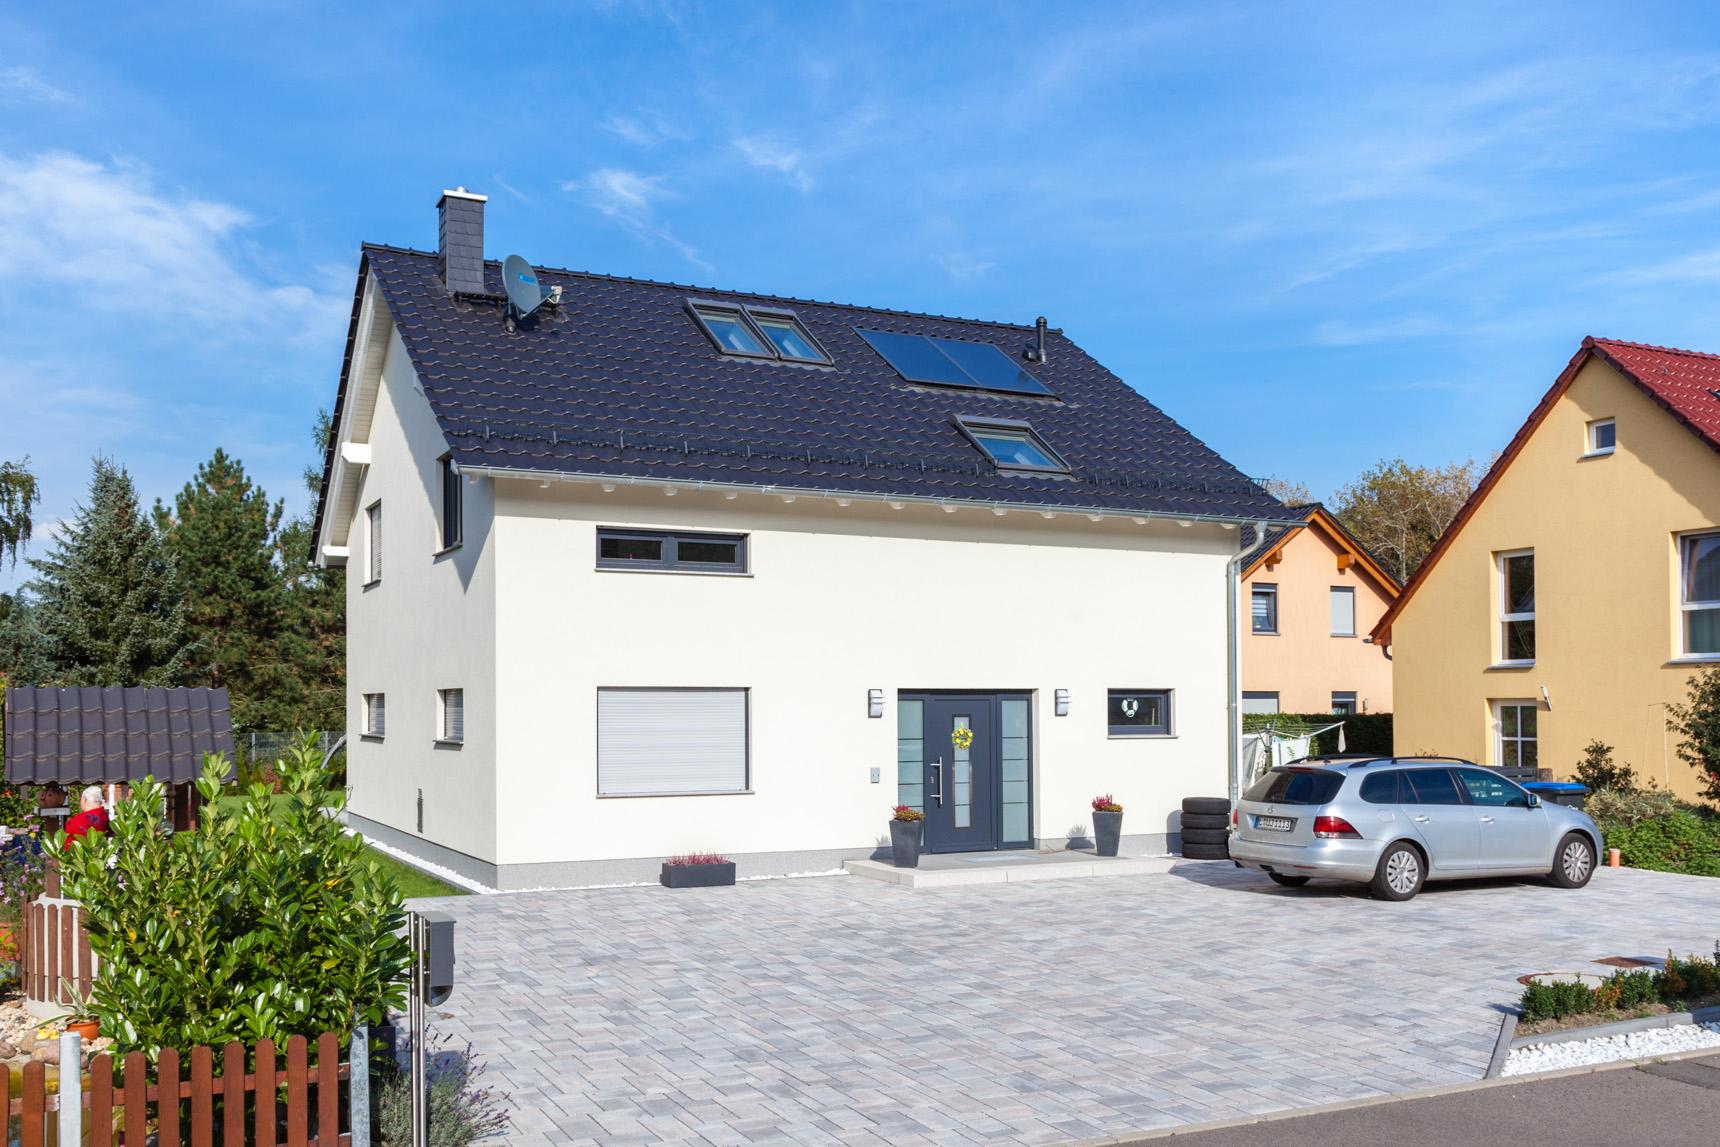 Referenz - Göhrenz - AGL Massivhaus Projektbau GmbH